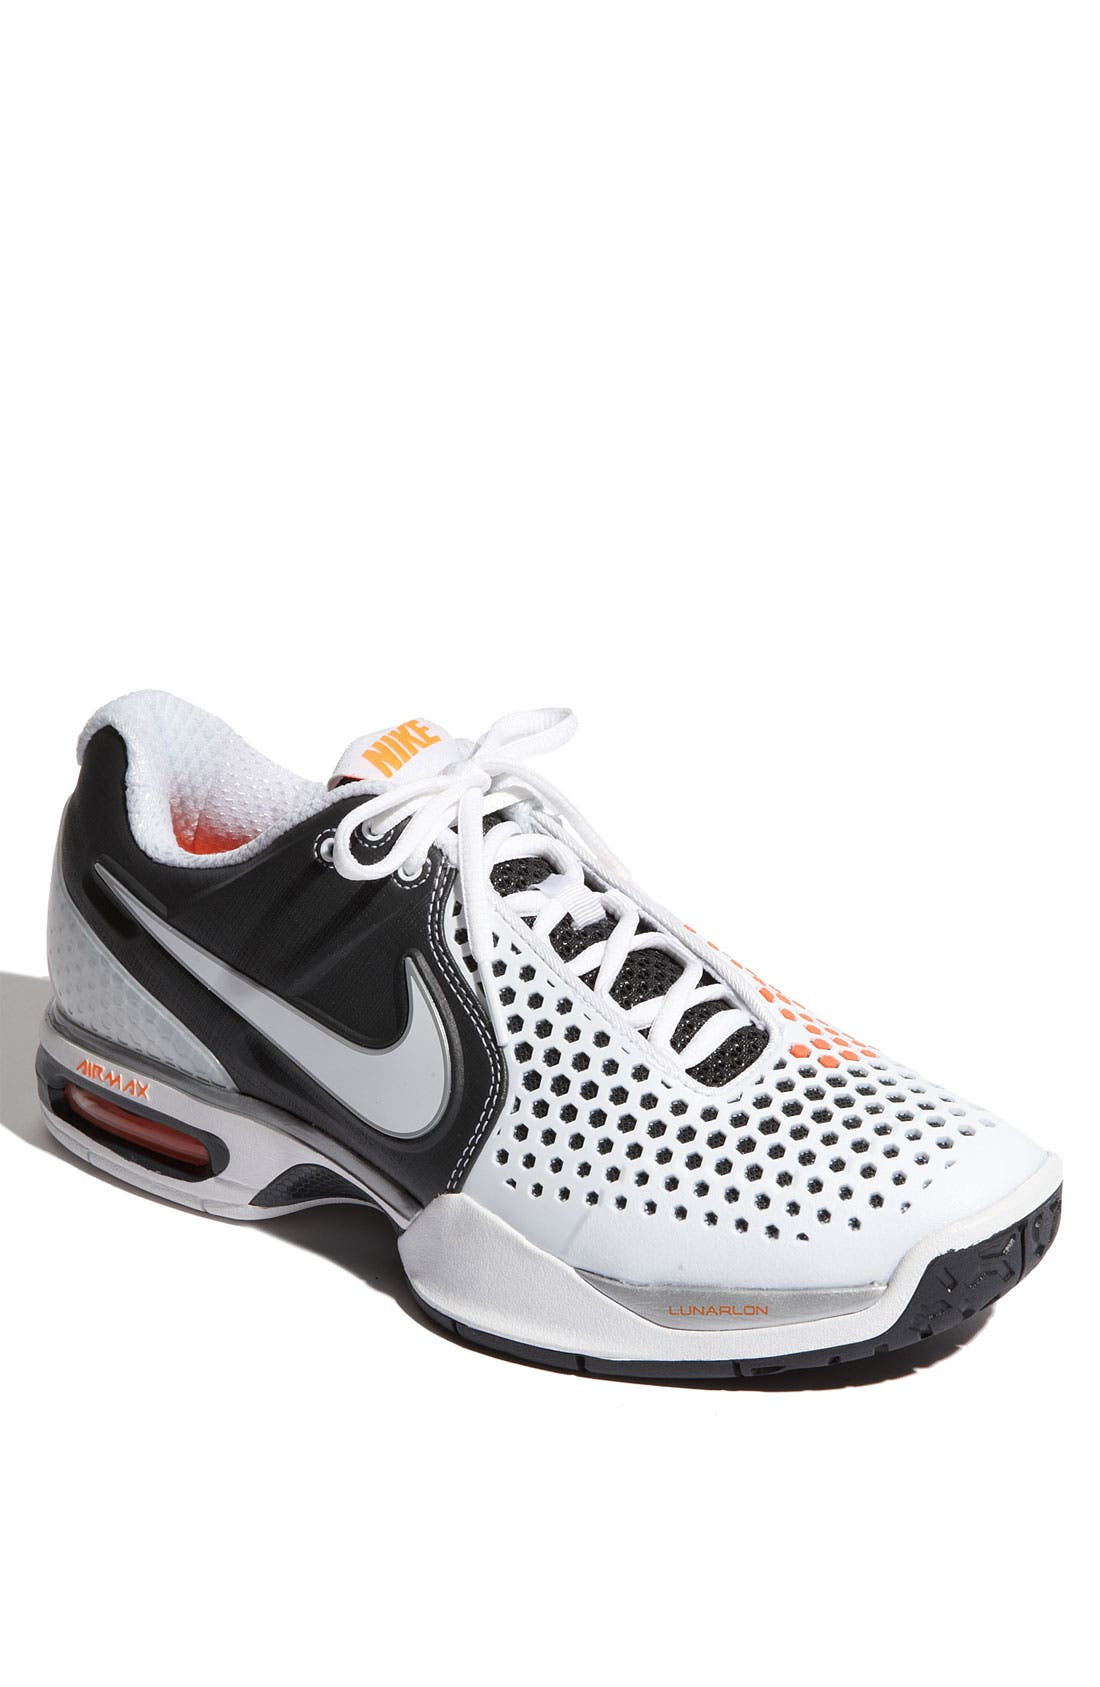 Main Image - Nike 'Air Max Court Ballistic 3.3' Tennis Shoe (Men)